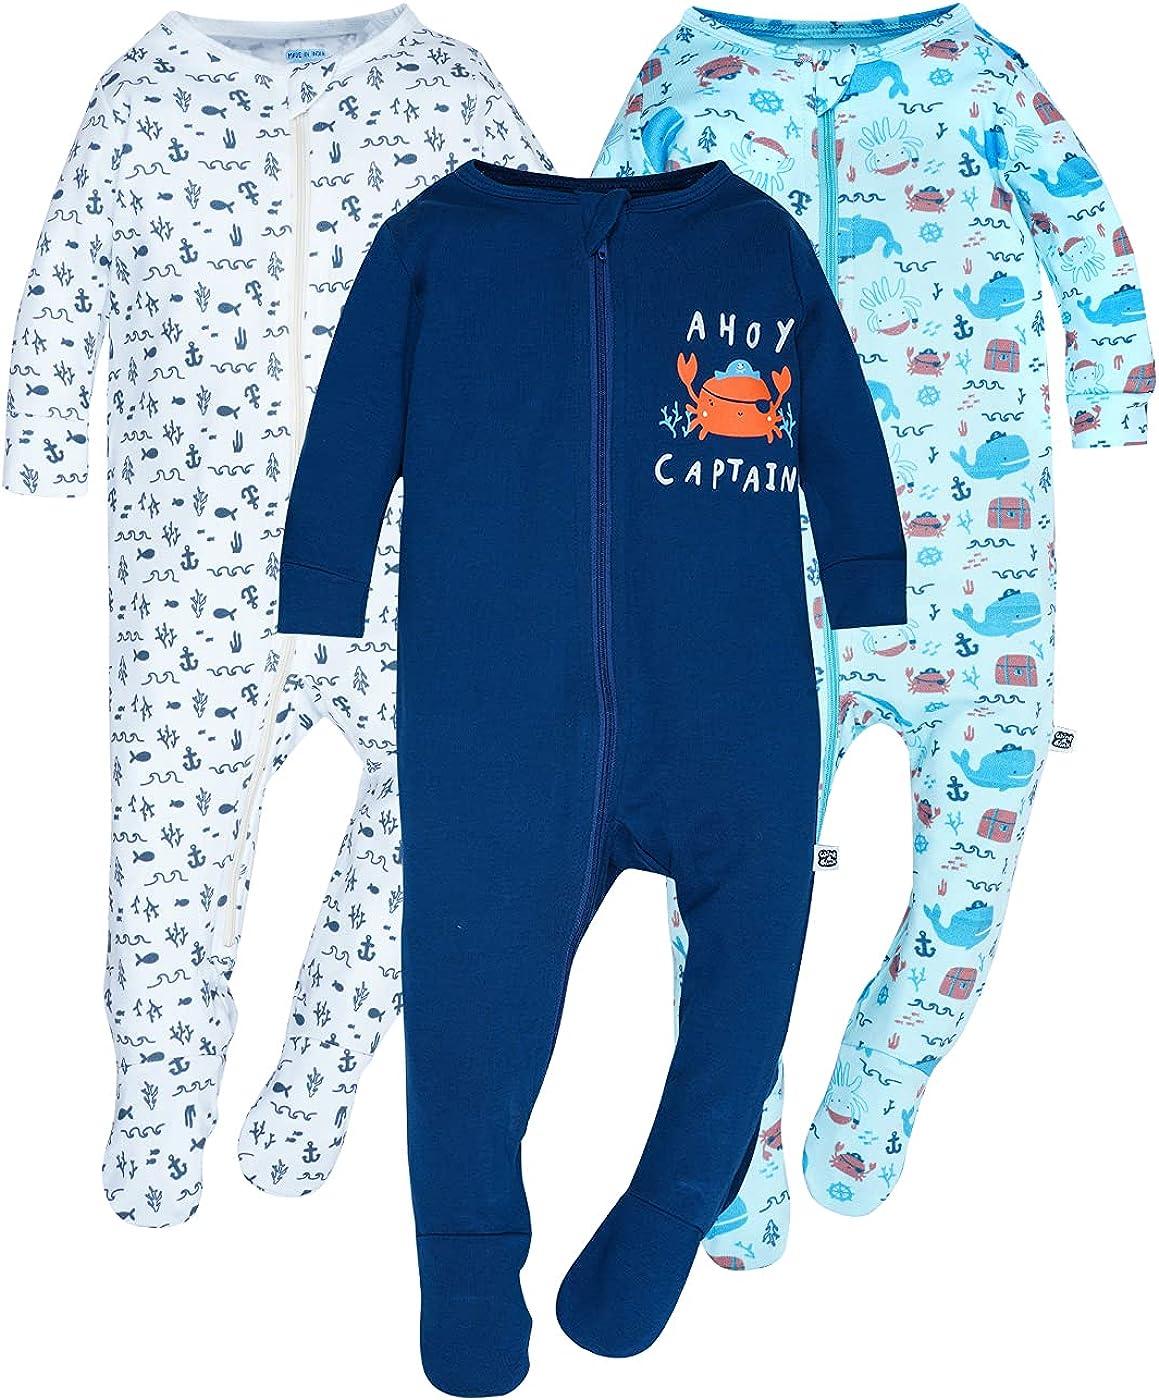 Rapid rise WINK BLINk Ahoy Captain Free shipping Organic Baby Sleep Jum Play 3-Pack N'